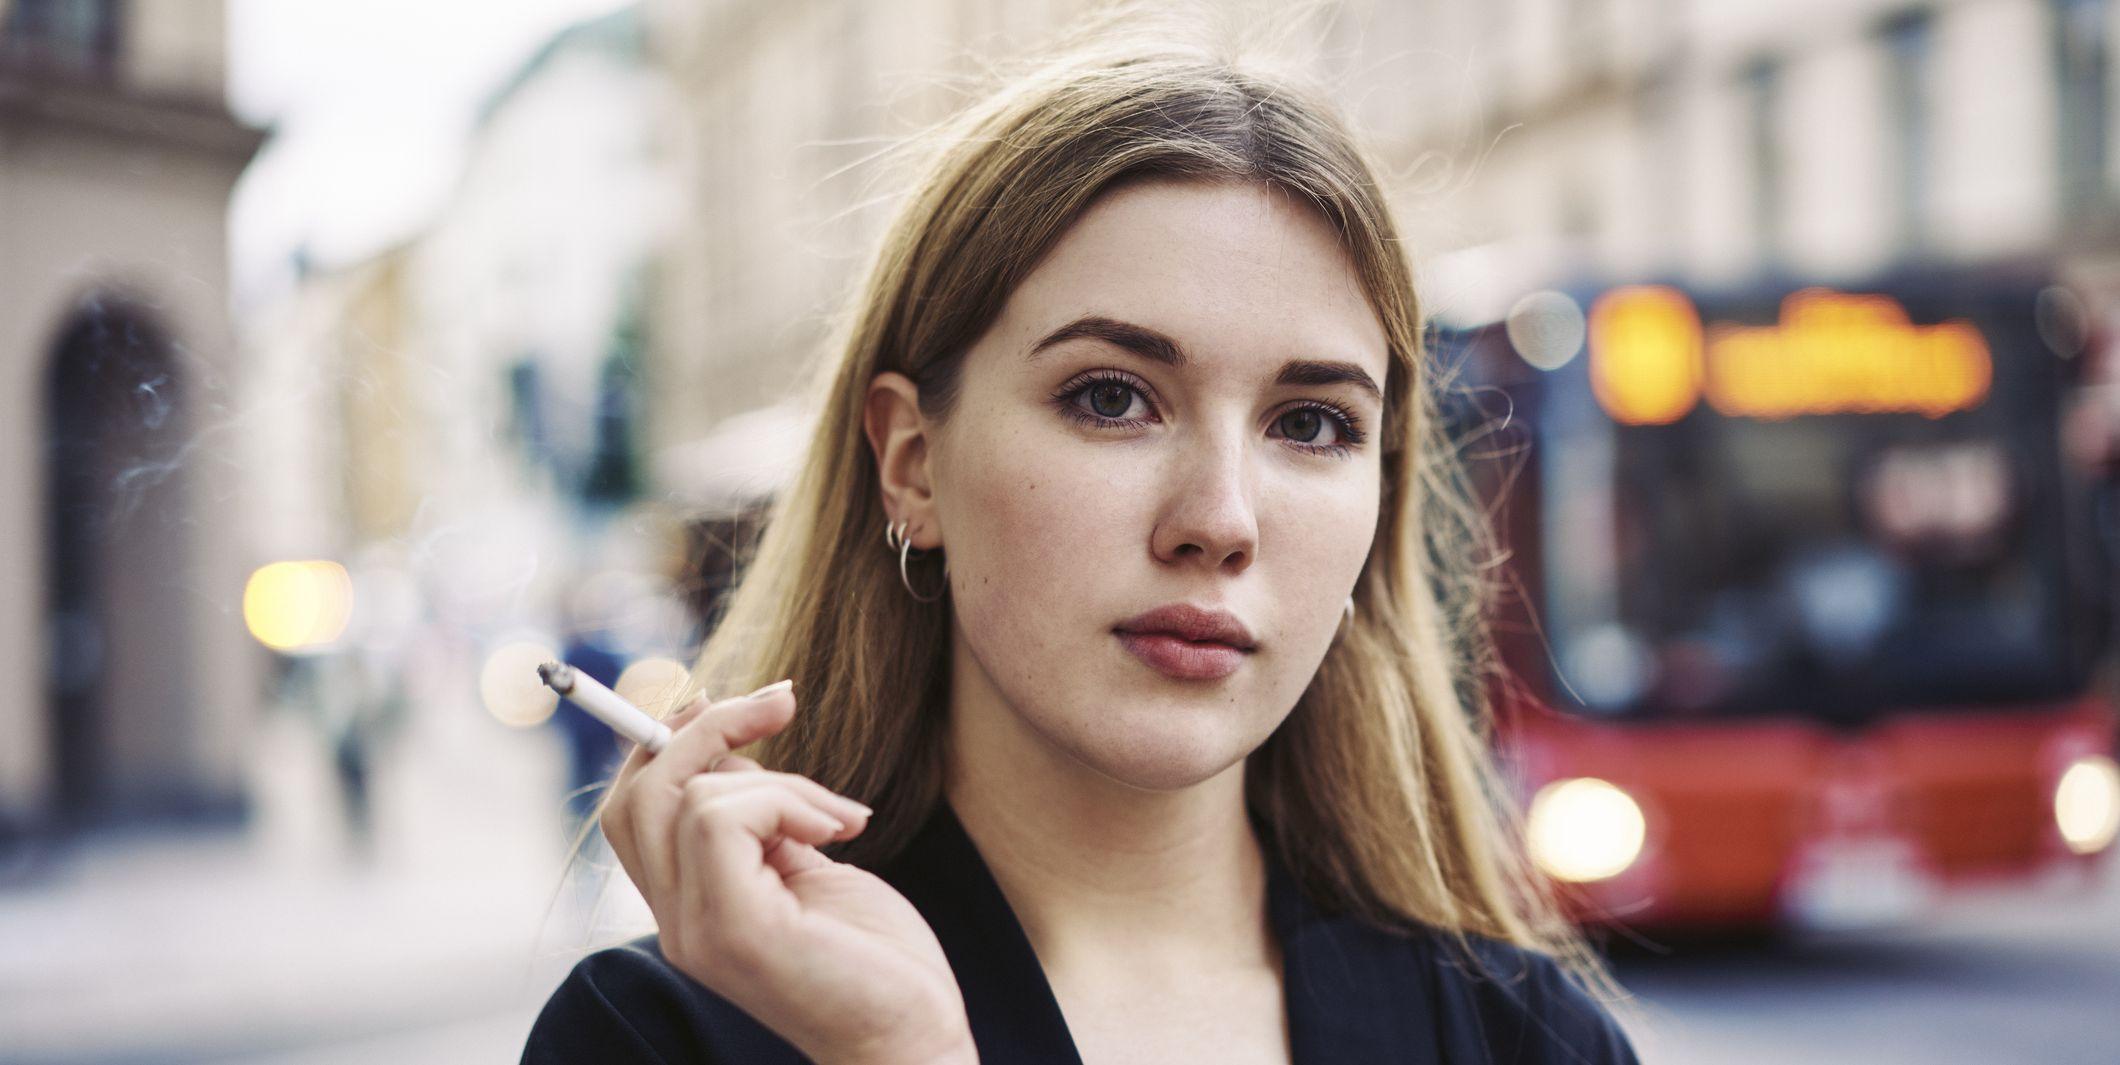 """Sweden, Uppland, Stockholm, Kungsholmen, Portrait of young woman smoking in street"""